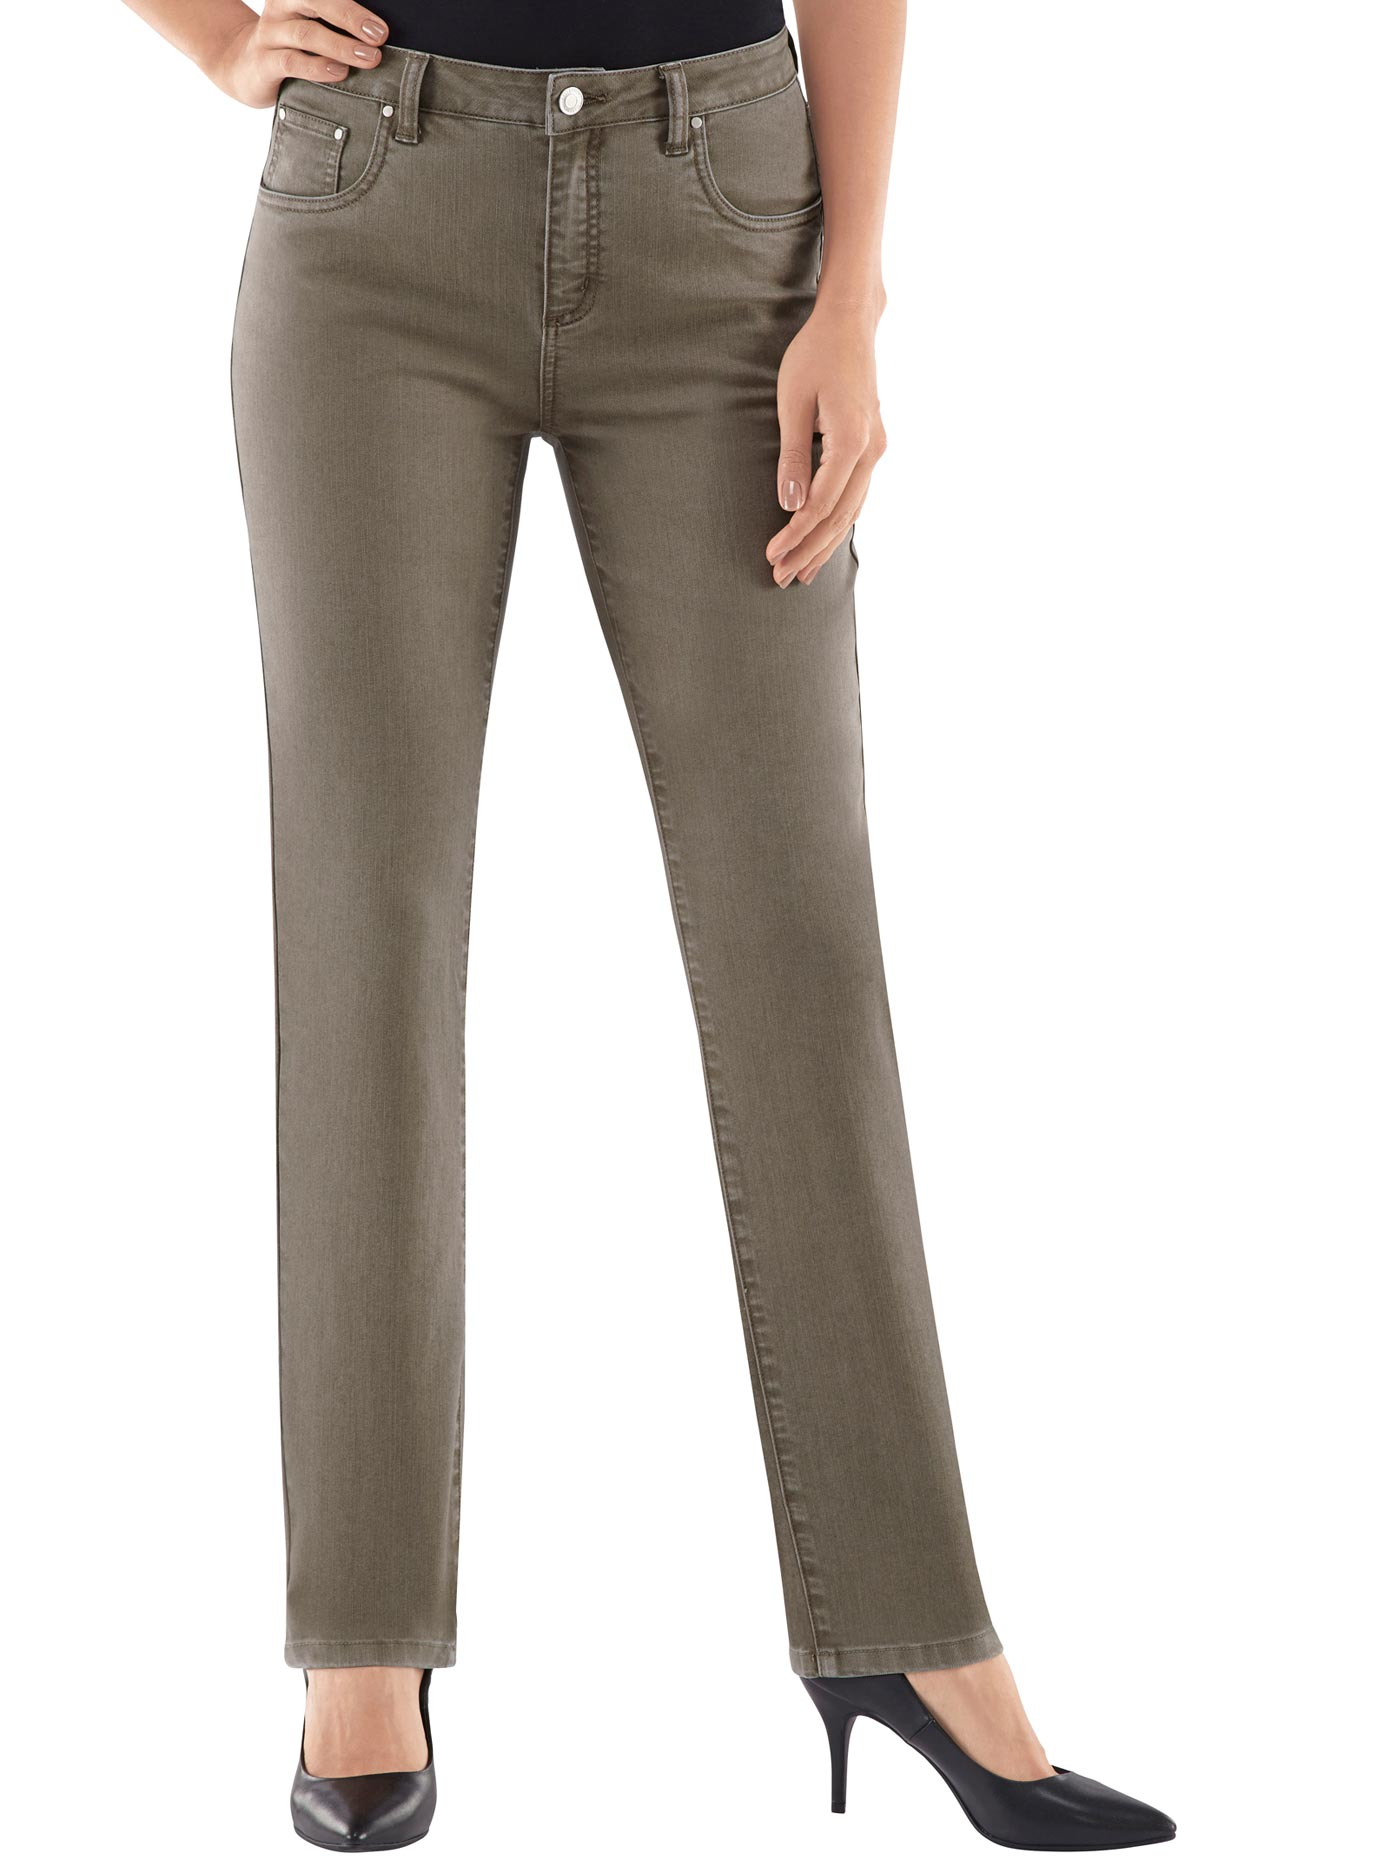 Casual Looks Hose in 5-Pocket Form   Bekleidung > Hosen > Sonstige Hosen   Casual Looks